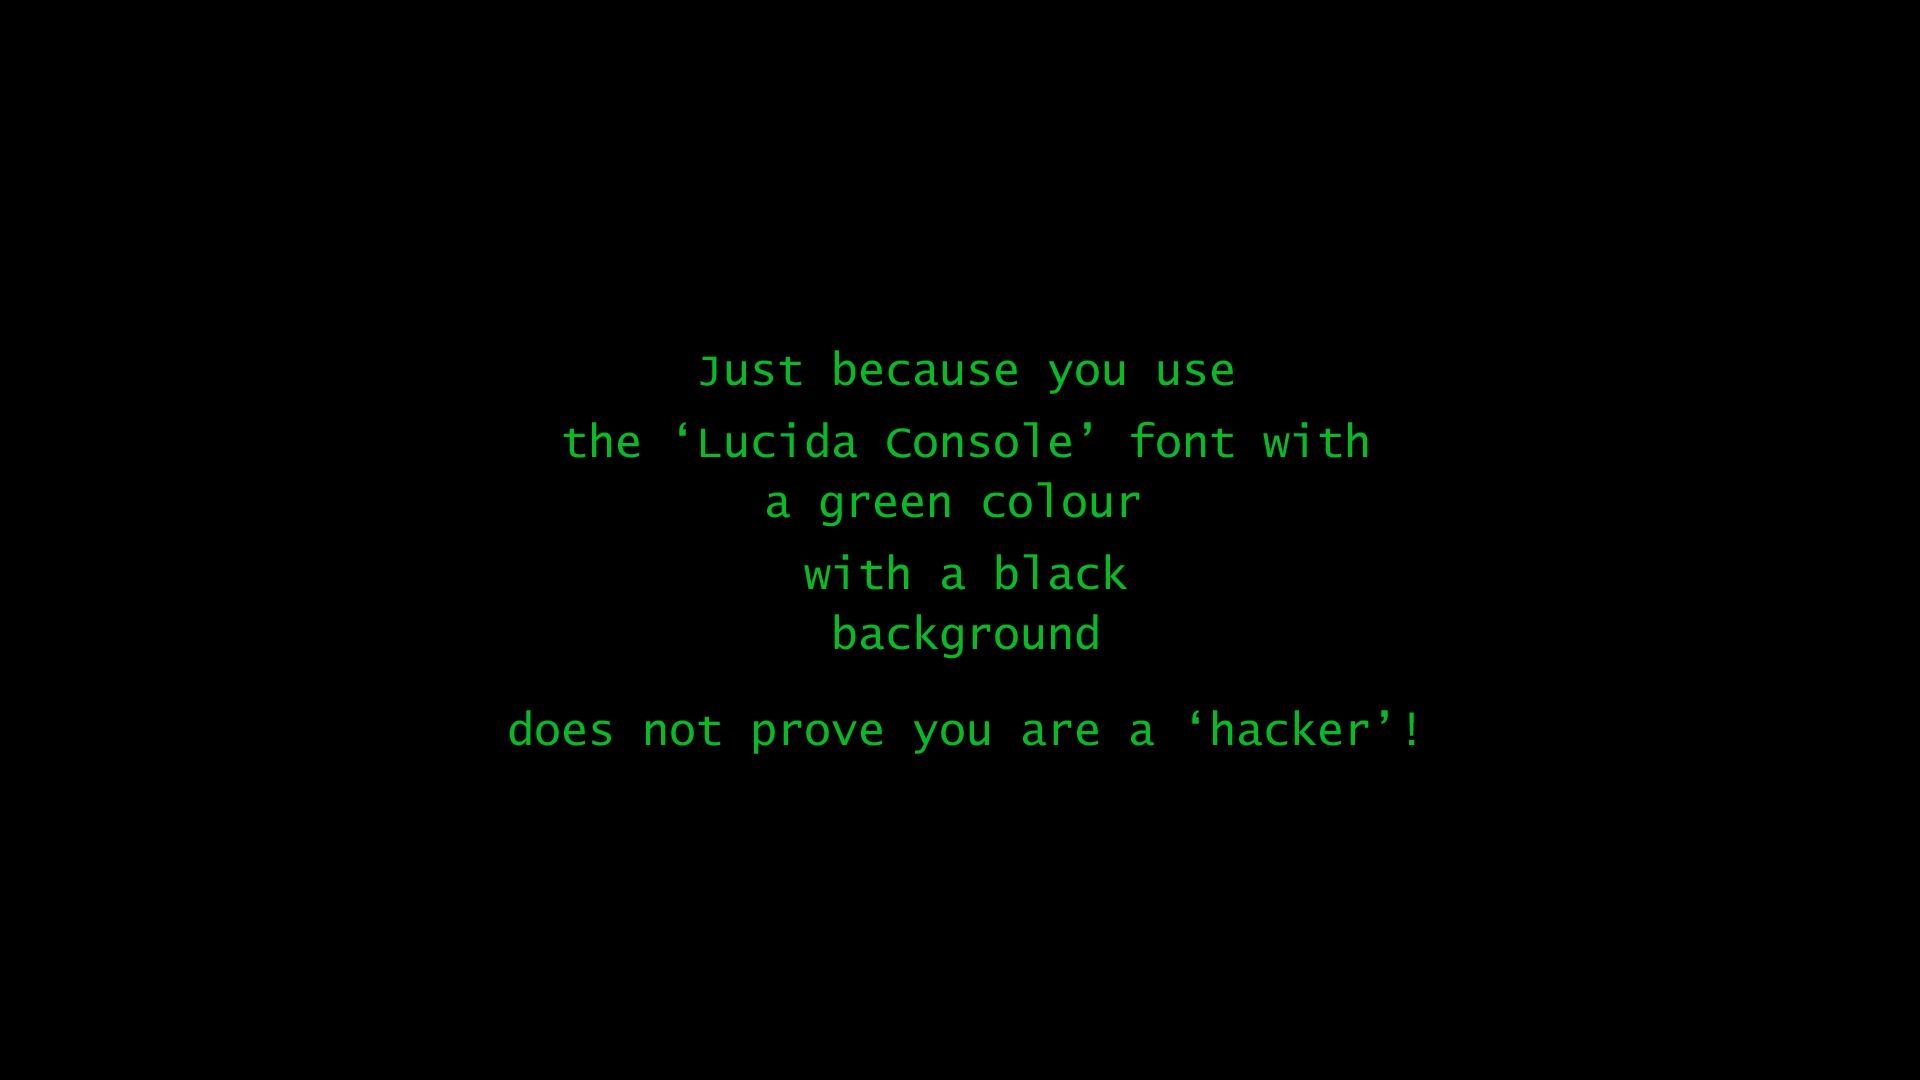 Hacker Wallpaper Green 1920x1080